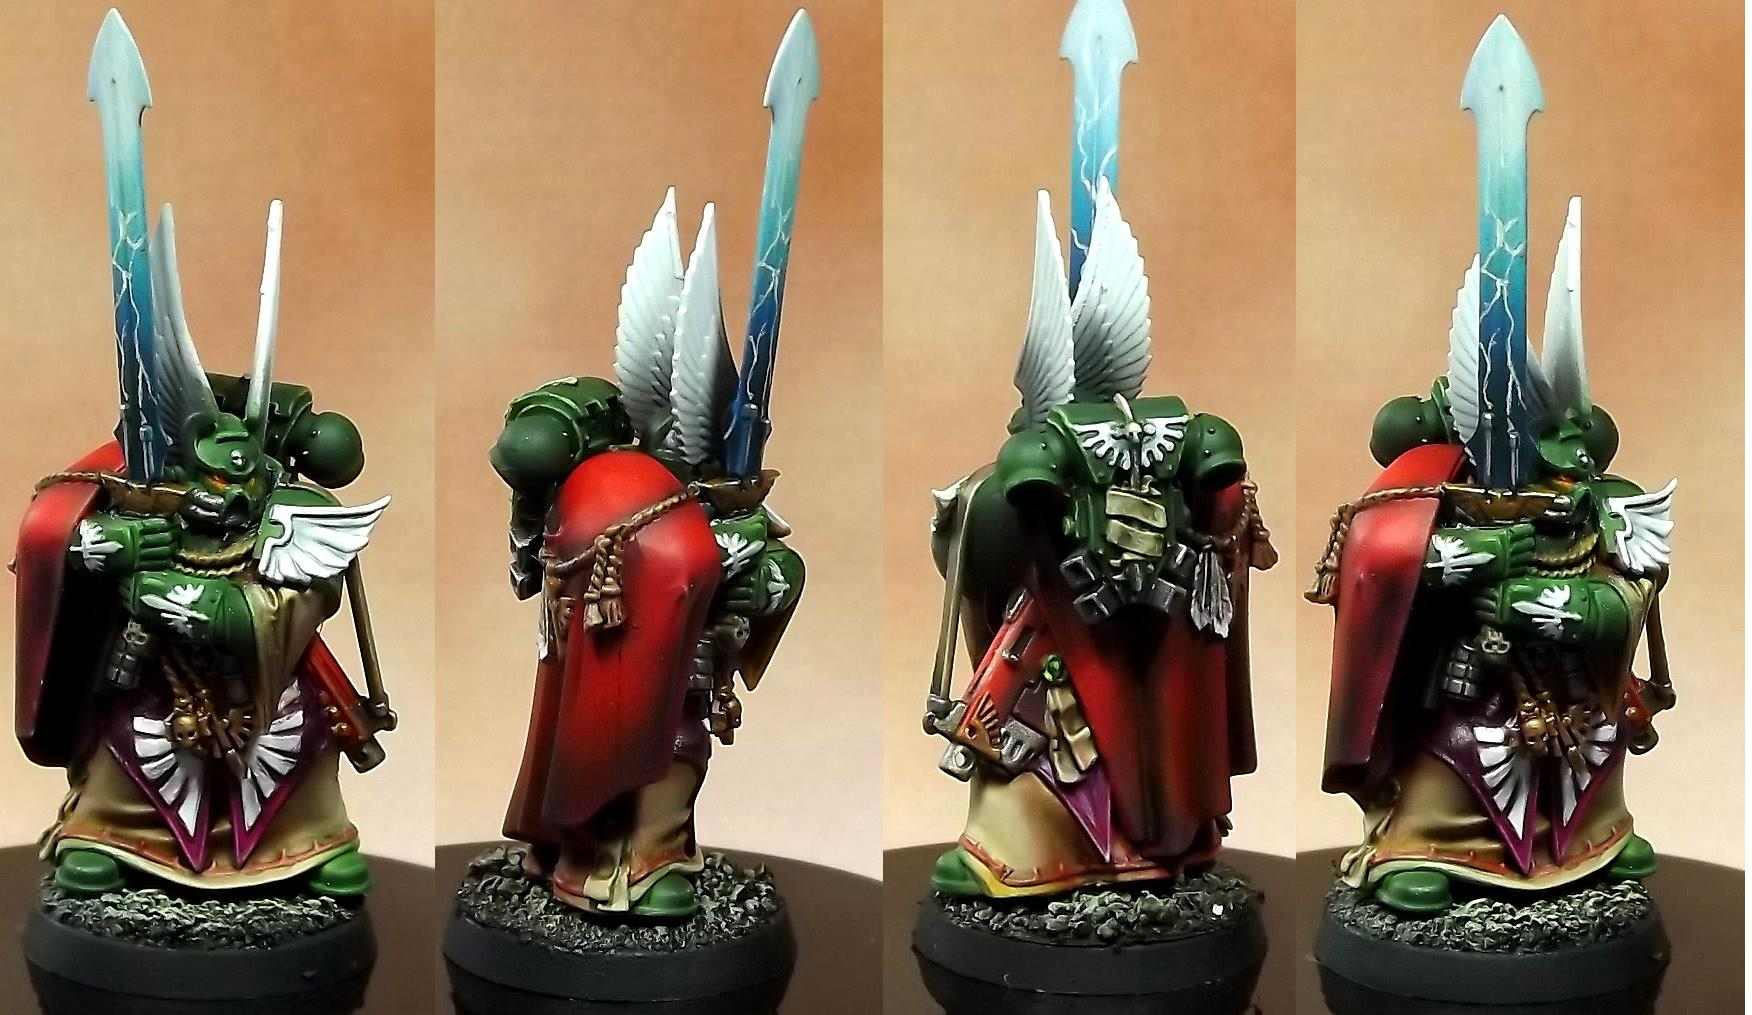 Aã©ro, Angel, Dark, Green, Librarian, Red, Squadron, Warhammer 40,000, Warhammer Fantasy